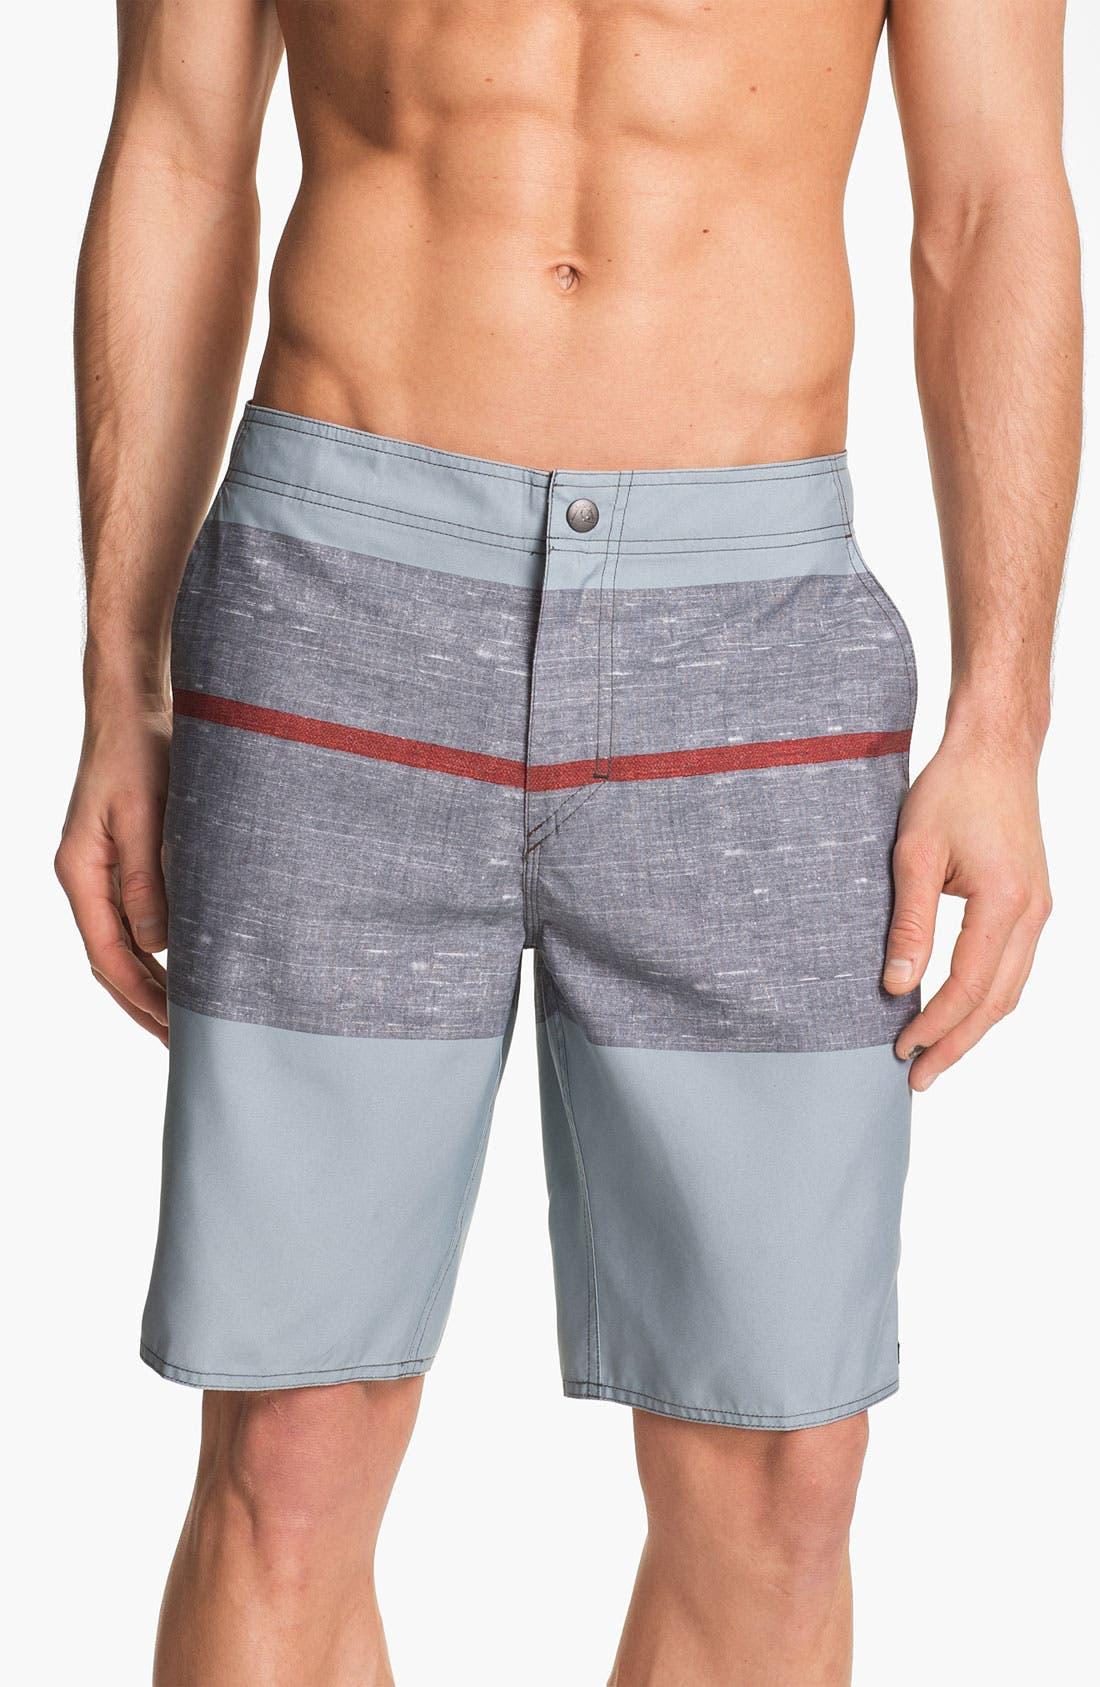 Alternate Image 1 Selected - Quiksilver 'Cruzcash' Shorts